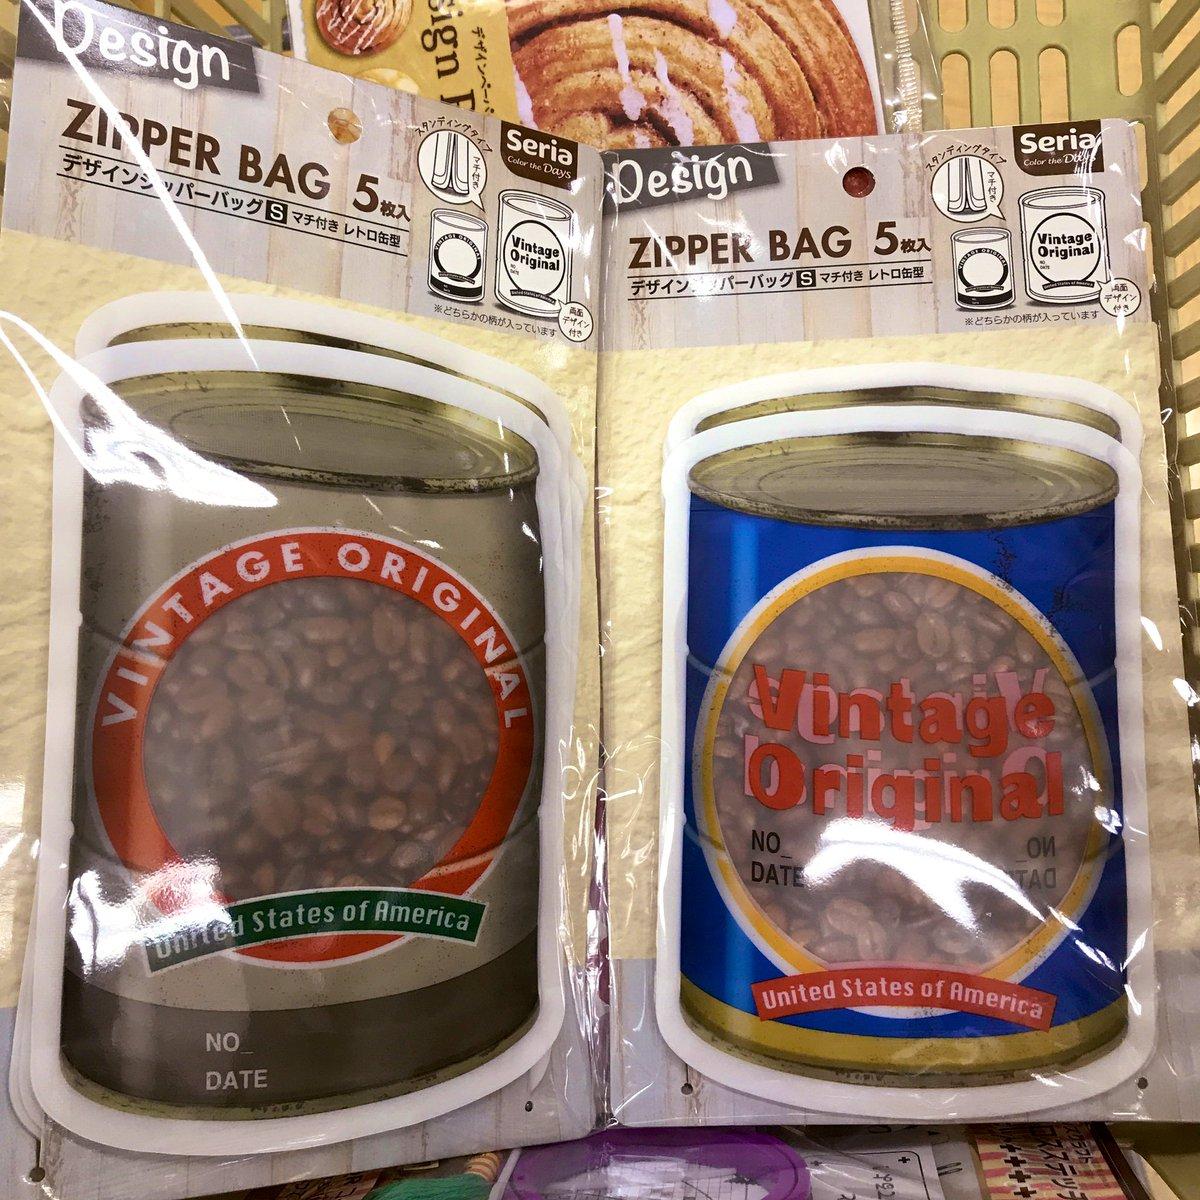 test ツイッターメディア - 今日のセリア購入品で載せ忘れた物😣💦 缶詰?風ジッパー❤  #セリパト #セリア #セリア購入品 #セリア新商品 #100均 #ジッパー https://t.co/f1SMK3GAKC